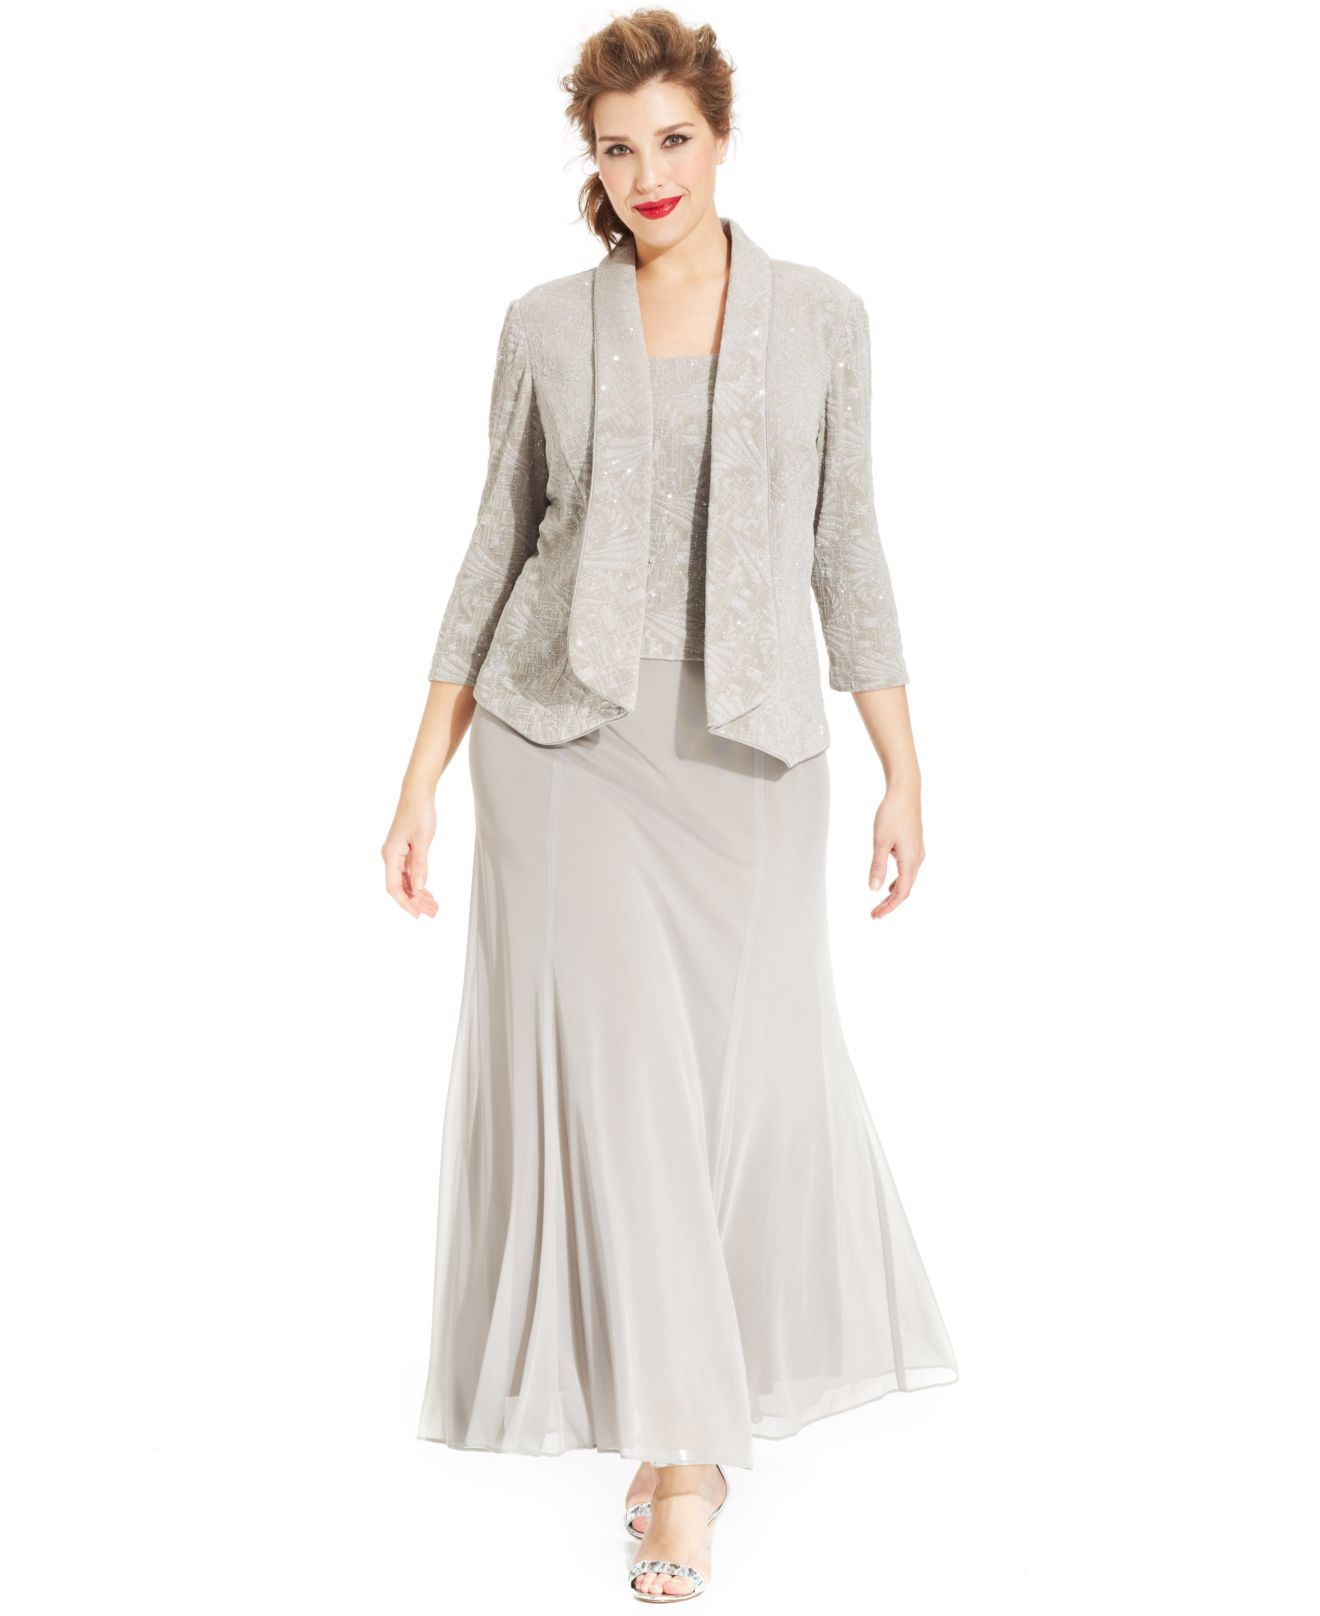 Alex Evenings Gray Plus Size Glitter Jacquard Dress And Jacket